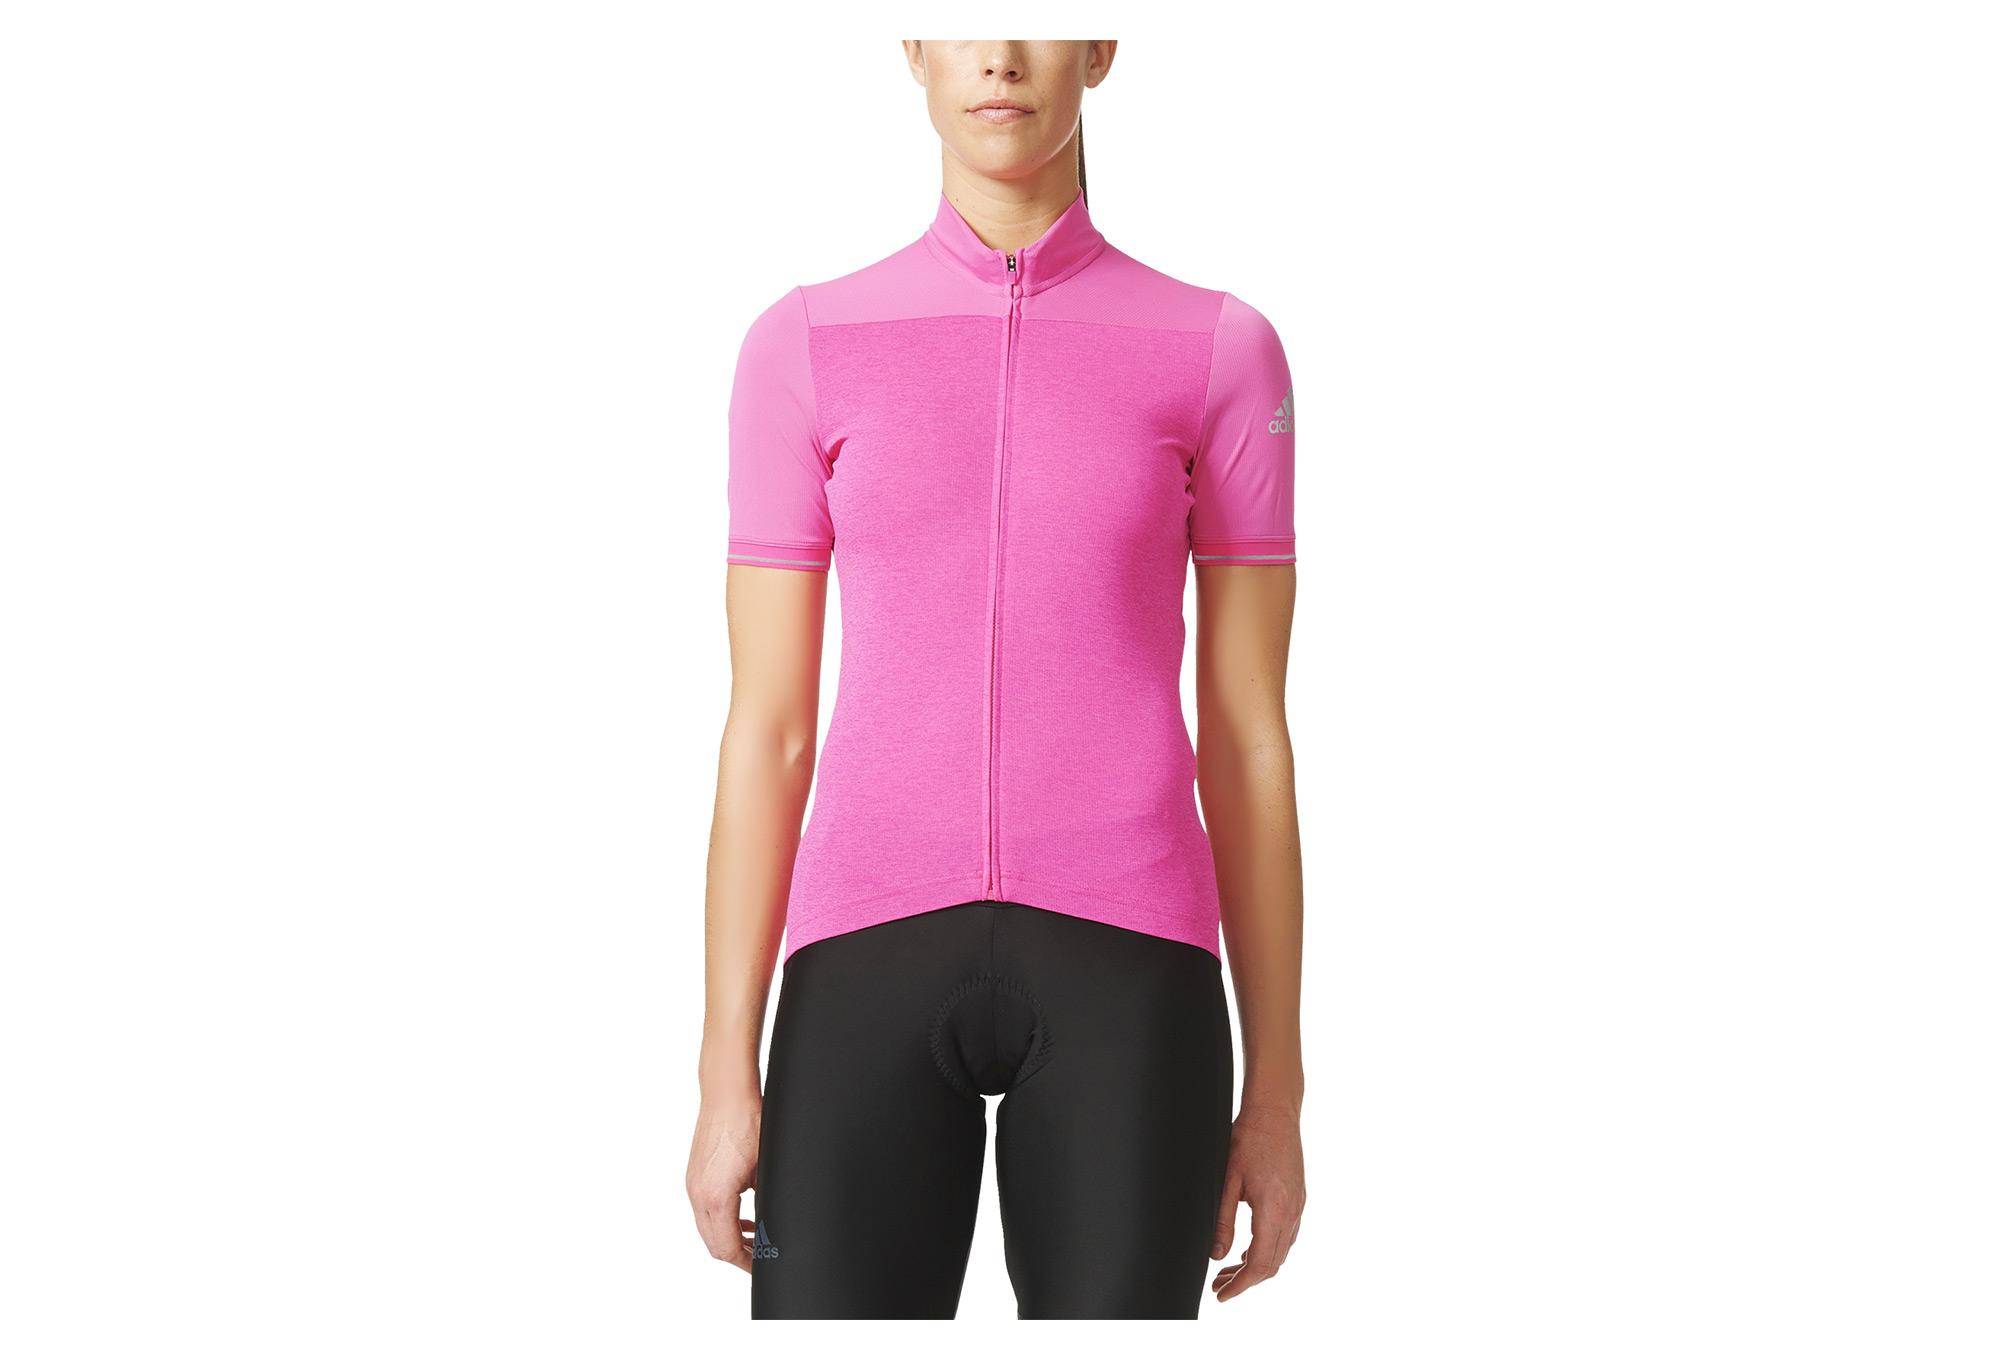 3b77660c82b62 adidas SUPERNOVA CLIMACHILL Short Sleeves Jersey Pink Women ...